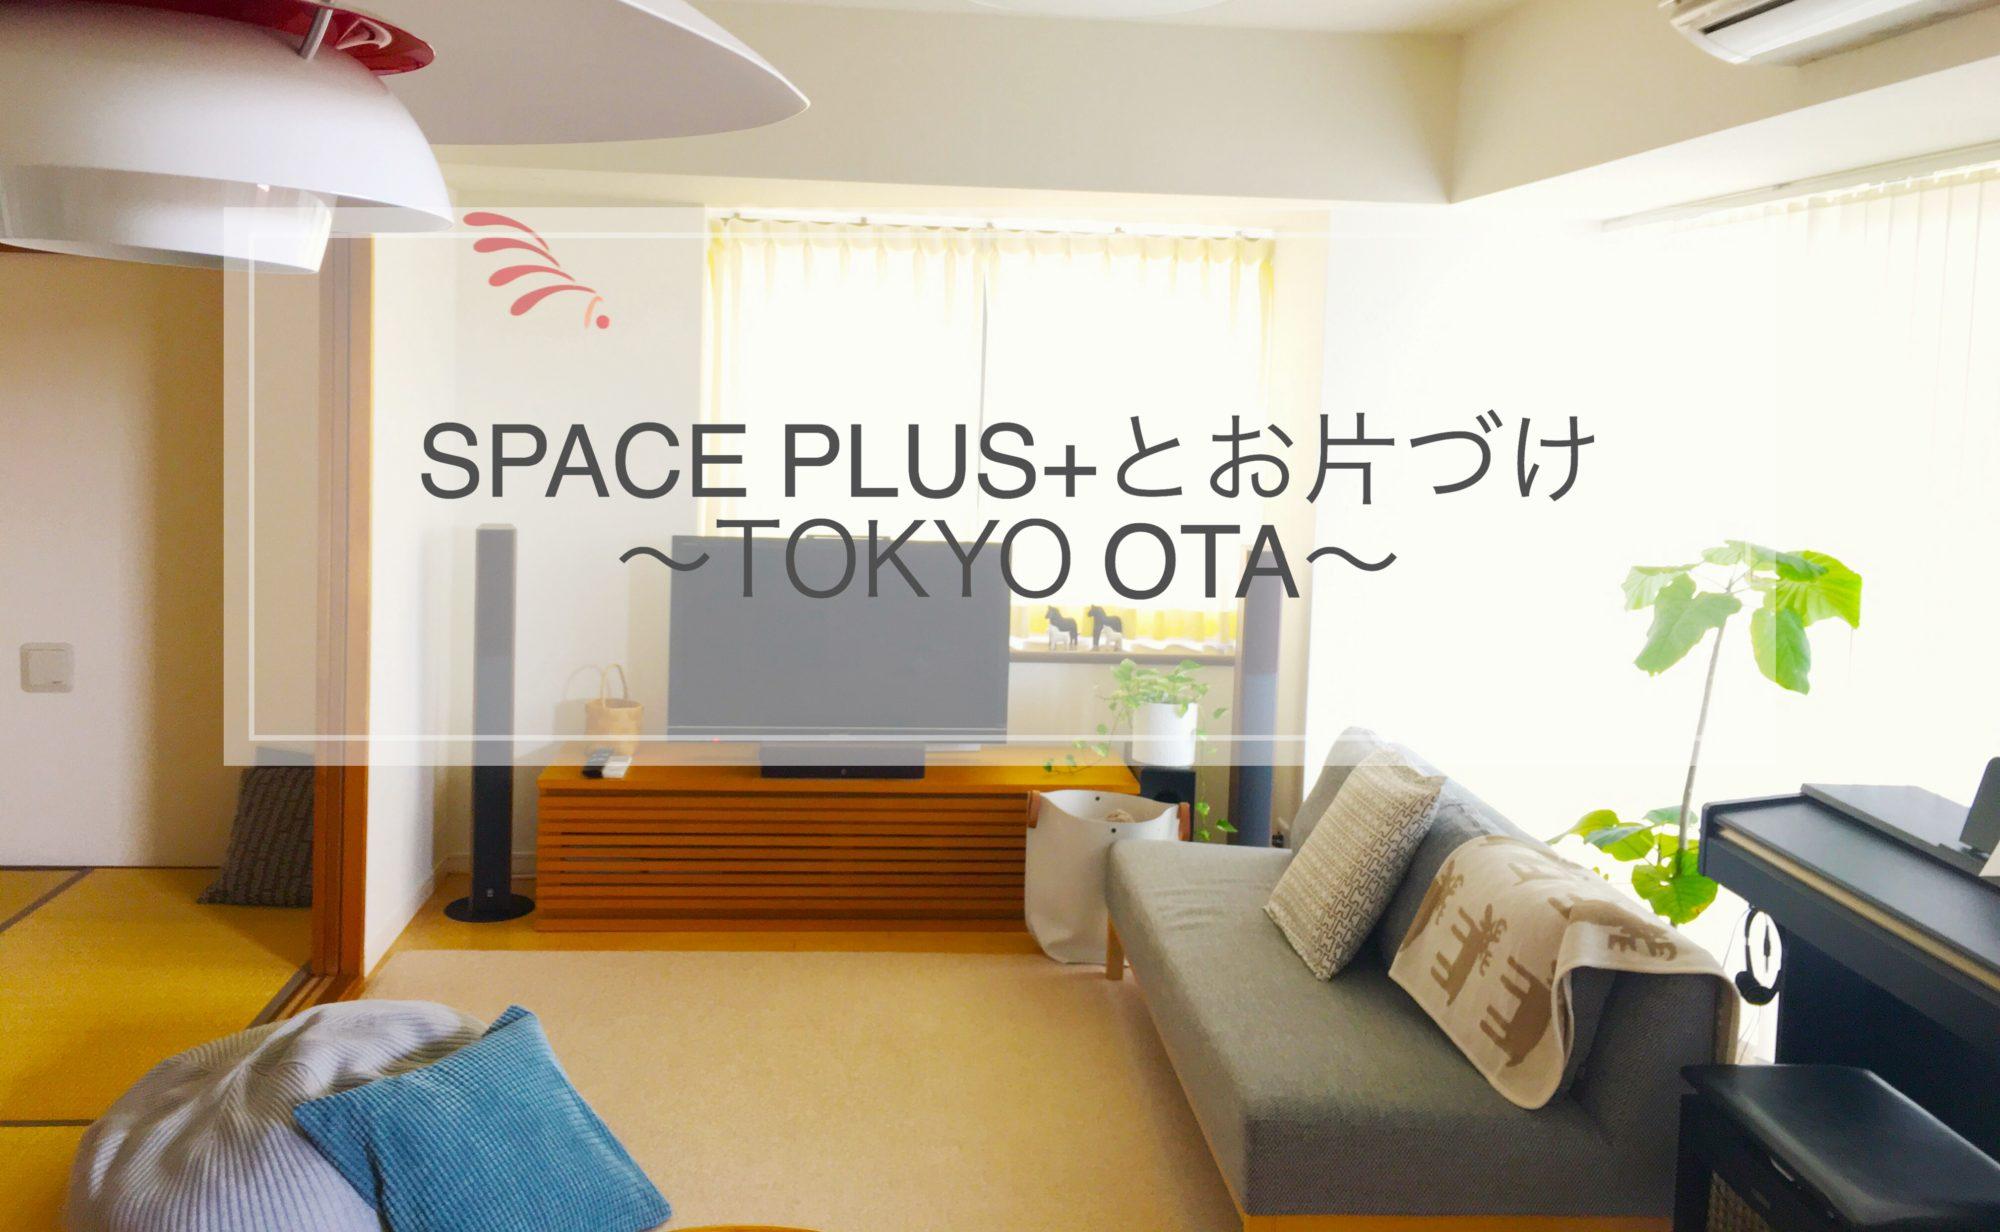 SPACE PLUS+とお片付け~ 東京都大田区~